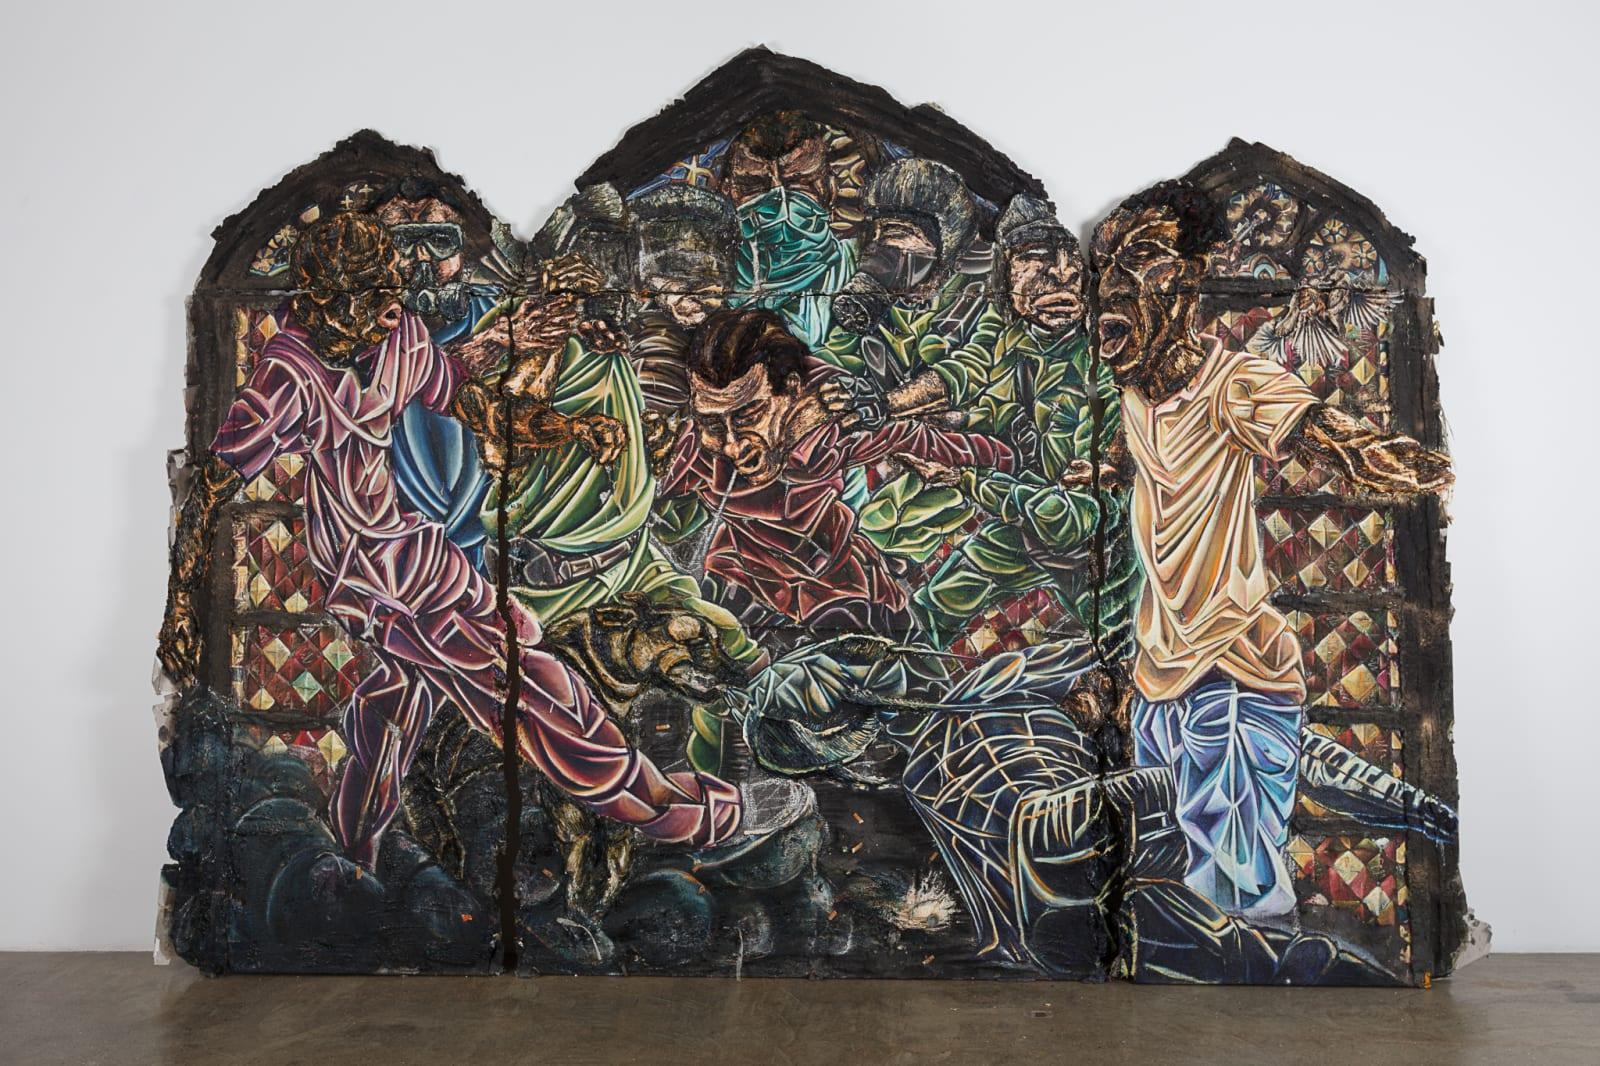 Raquel van Haver  Definition of a system 2, 2017  Oil paint, resin, plaster, gel, charrcoal, hair, ash, wood, paper and tar on burlap  249 x 344 cm